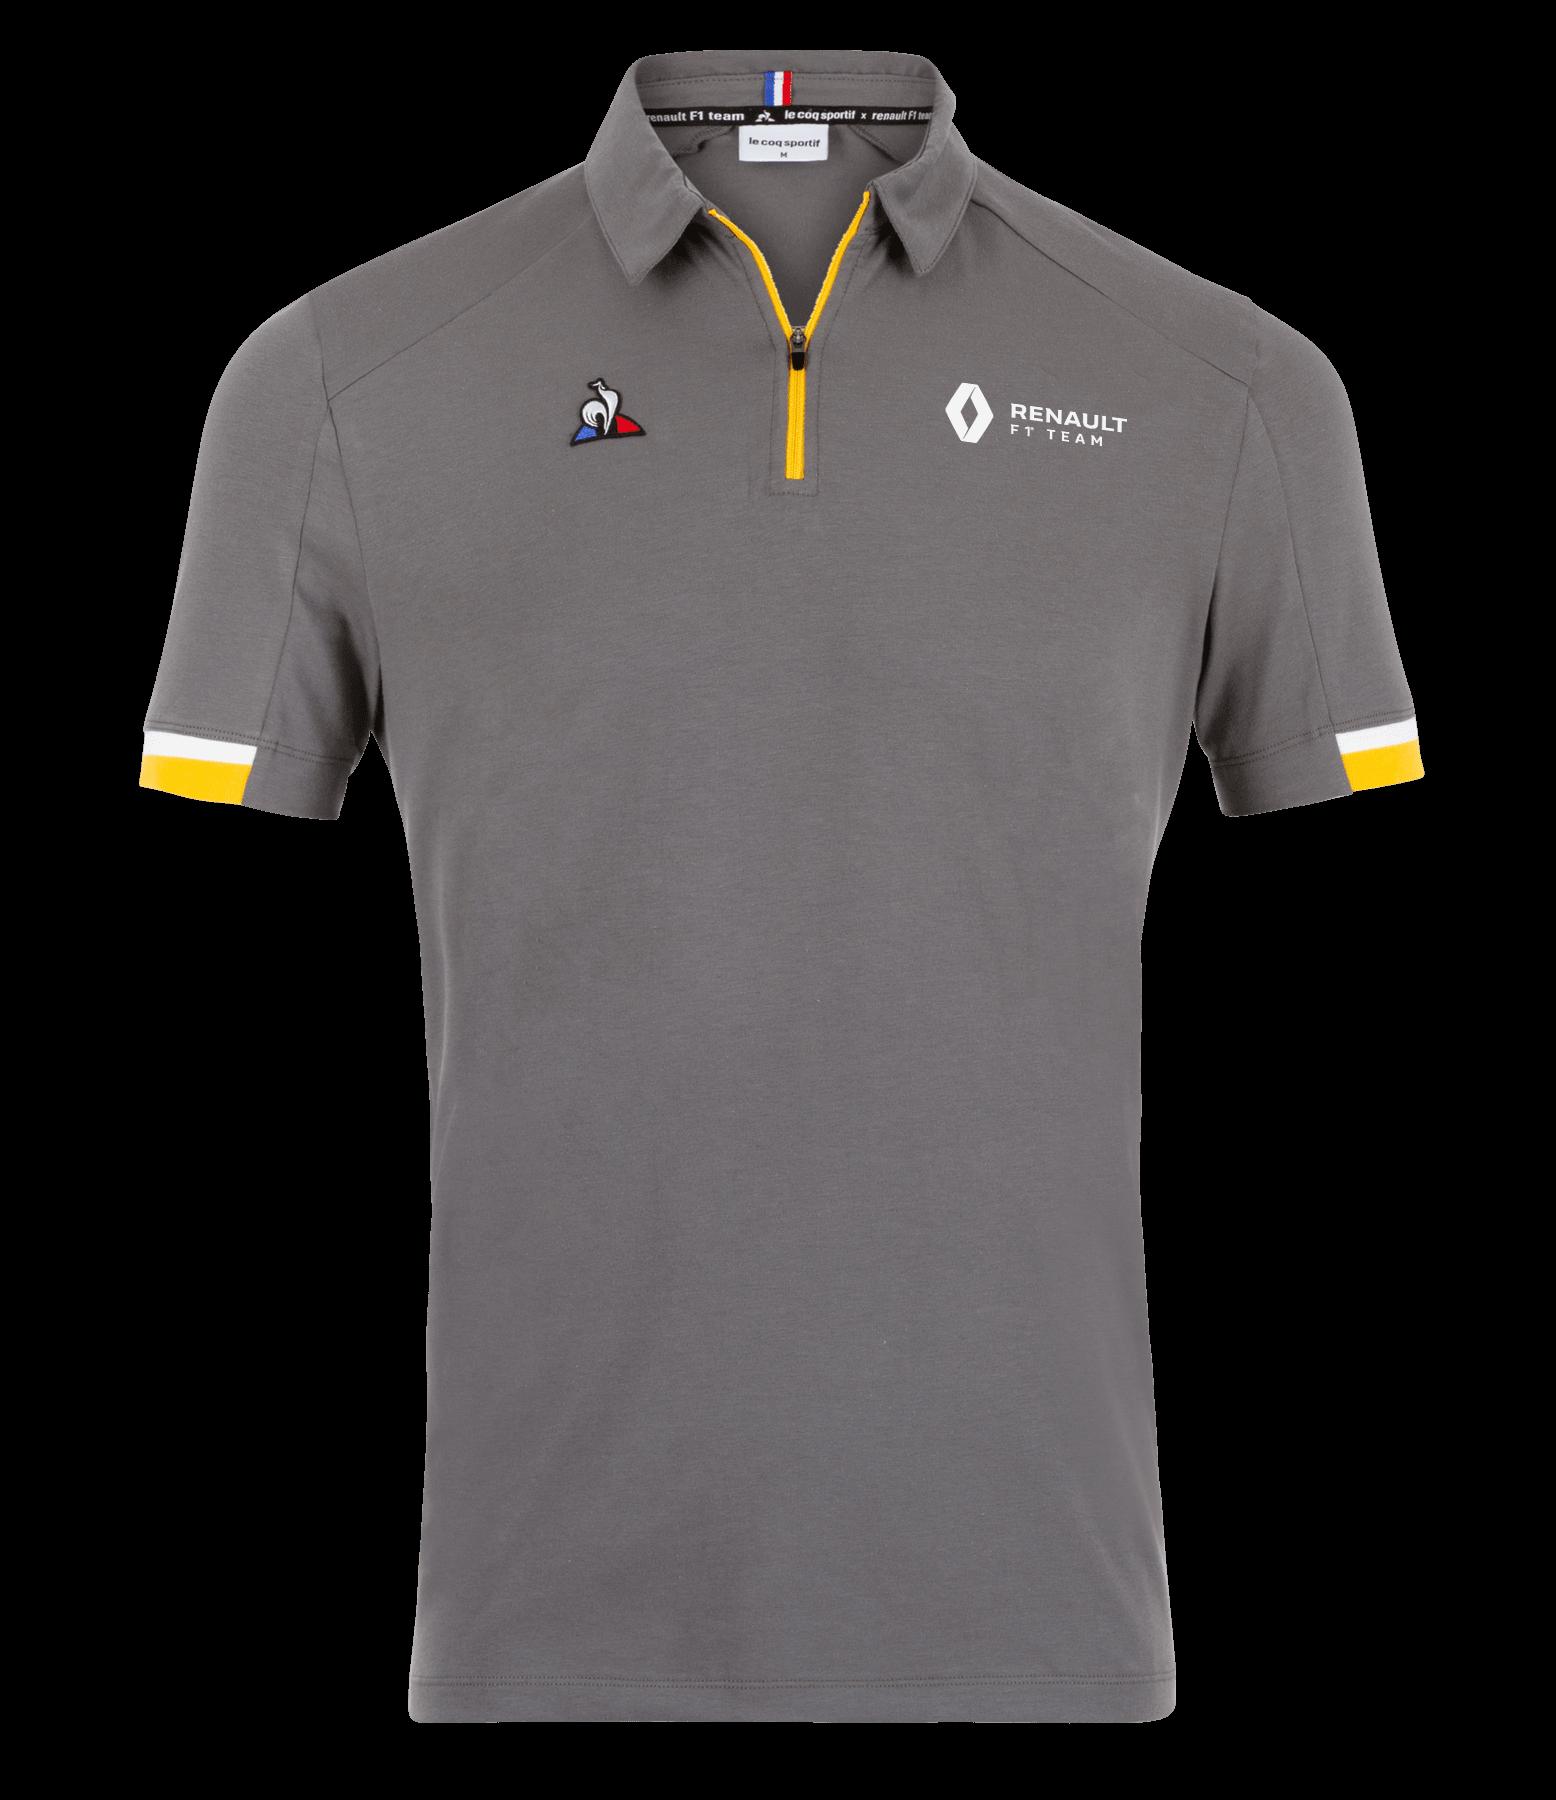 RENAULT F1® TEAM 2019 men's poloshirt - grey